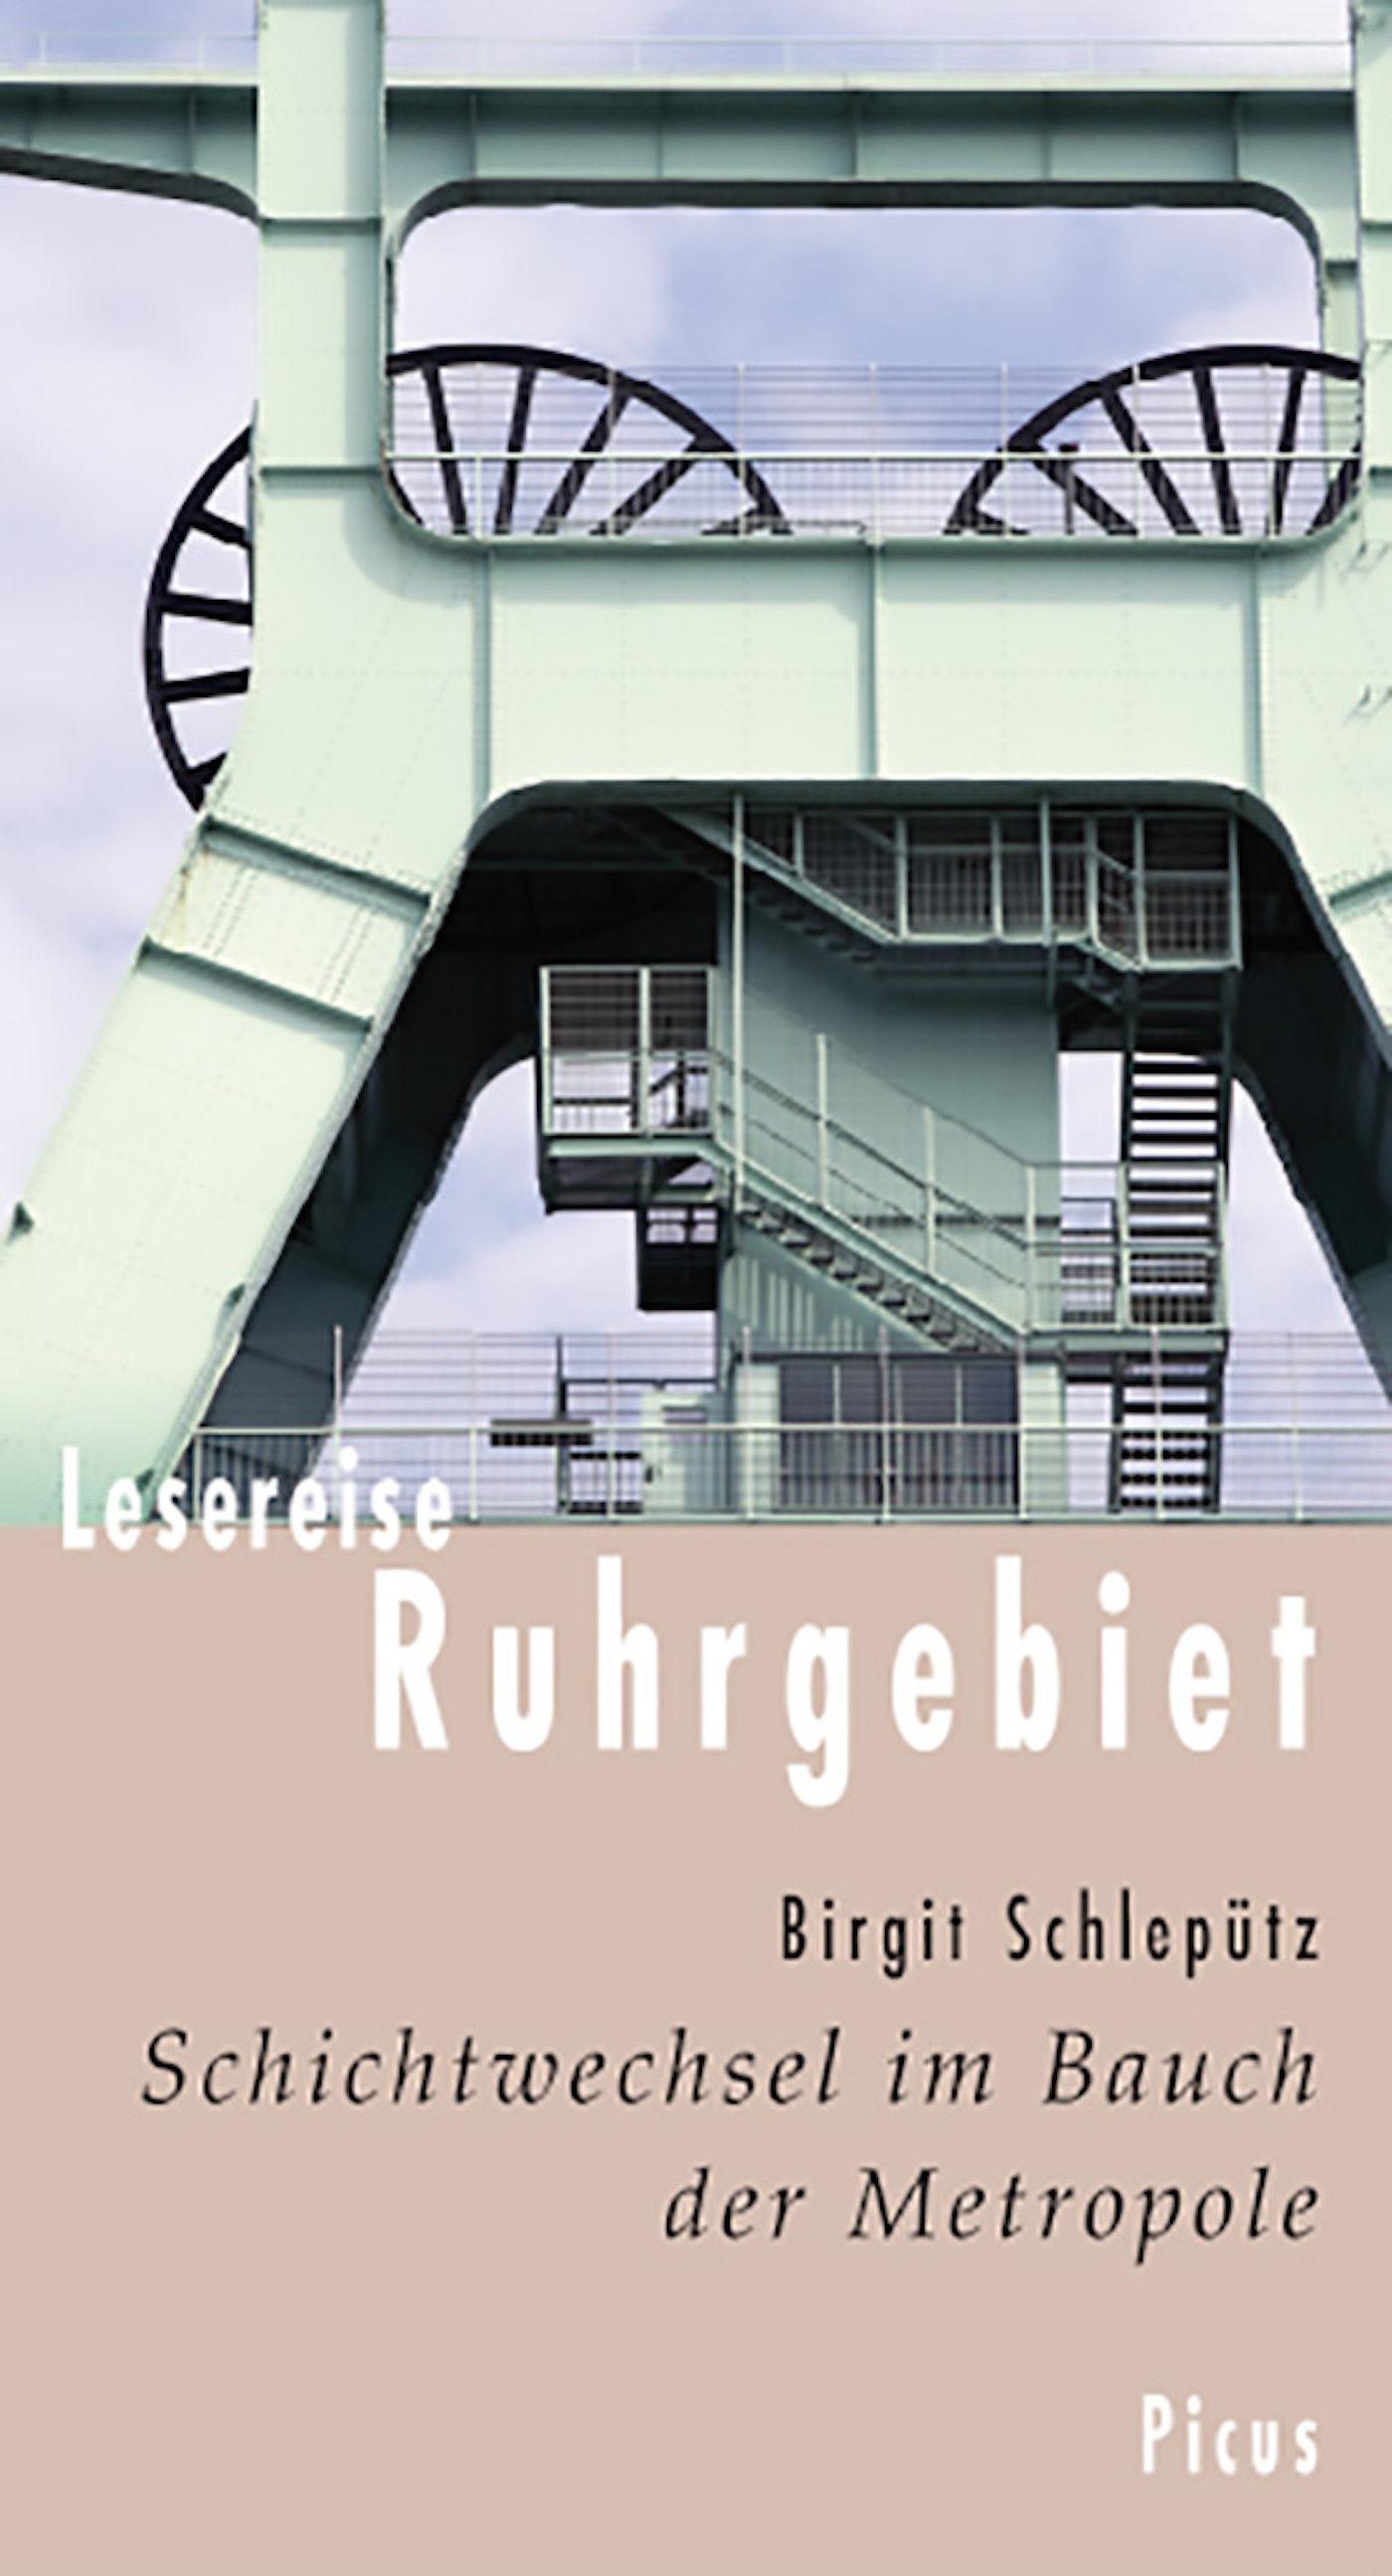 Lesereise Ruhrgebiet Descargar ebooks Epub